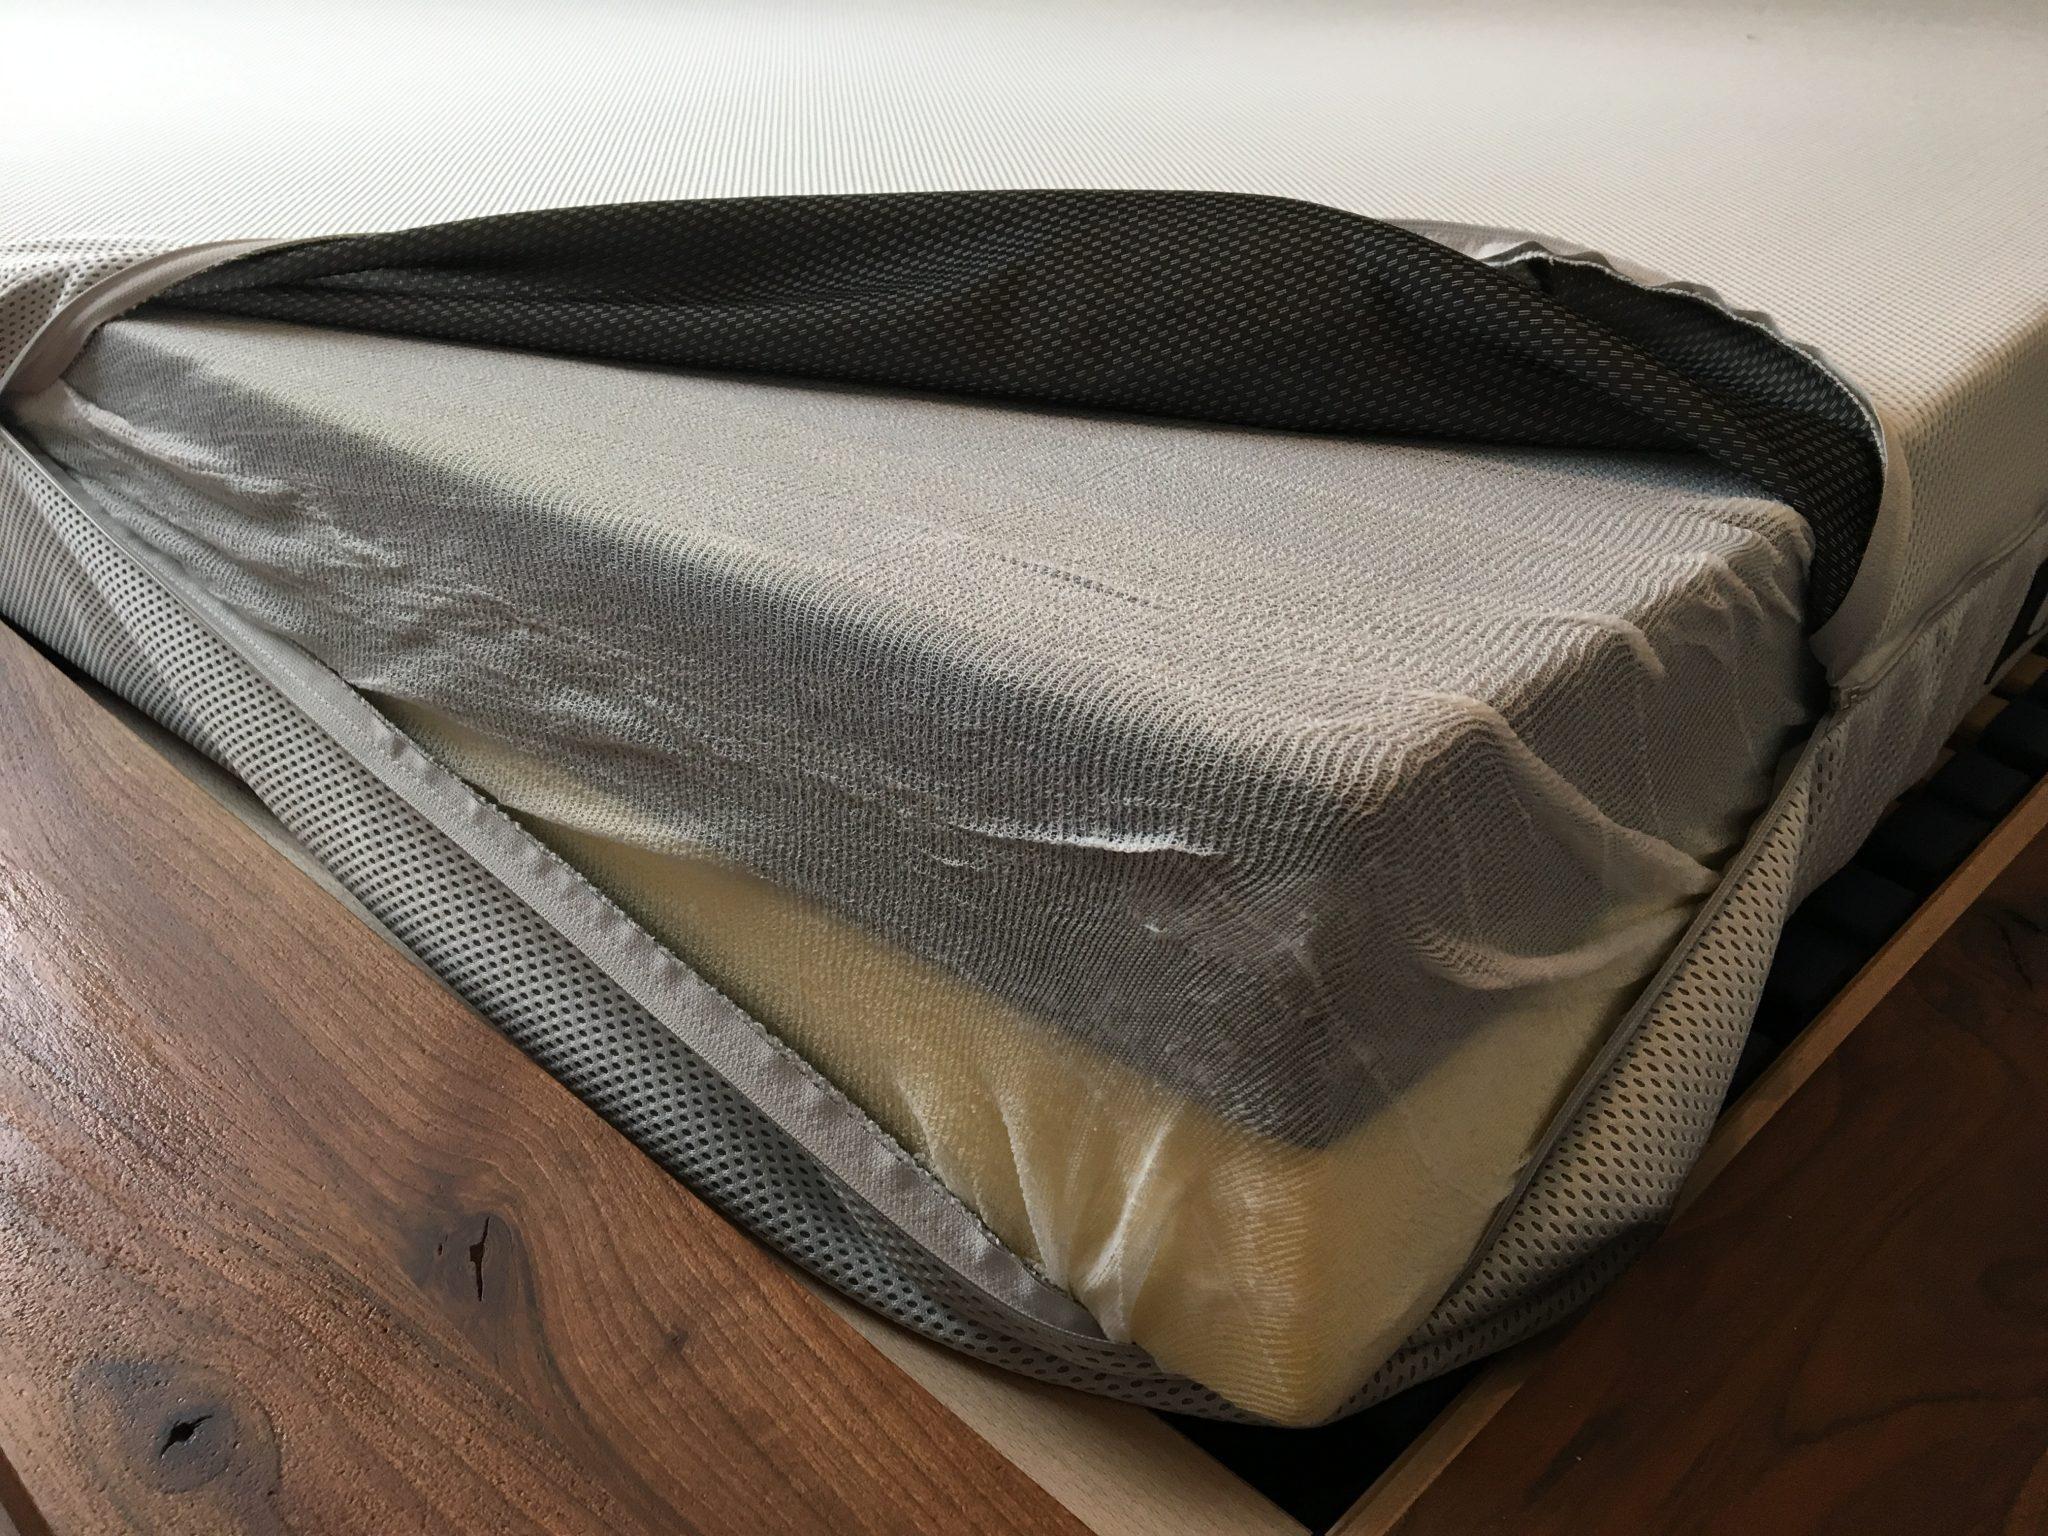 bodyguard stiftung warentest testsieger detailtest mit 6 fotos. Black Bedroom Furniture Sets. Home Design Ideas